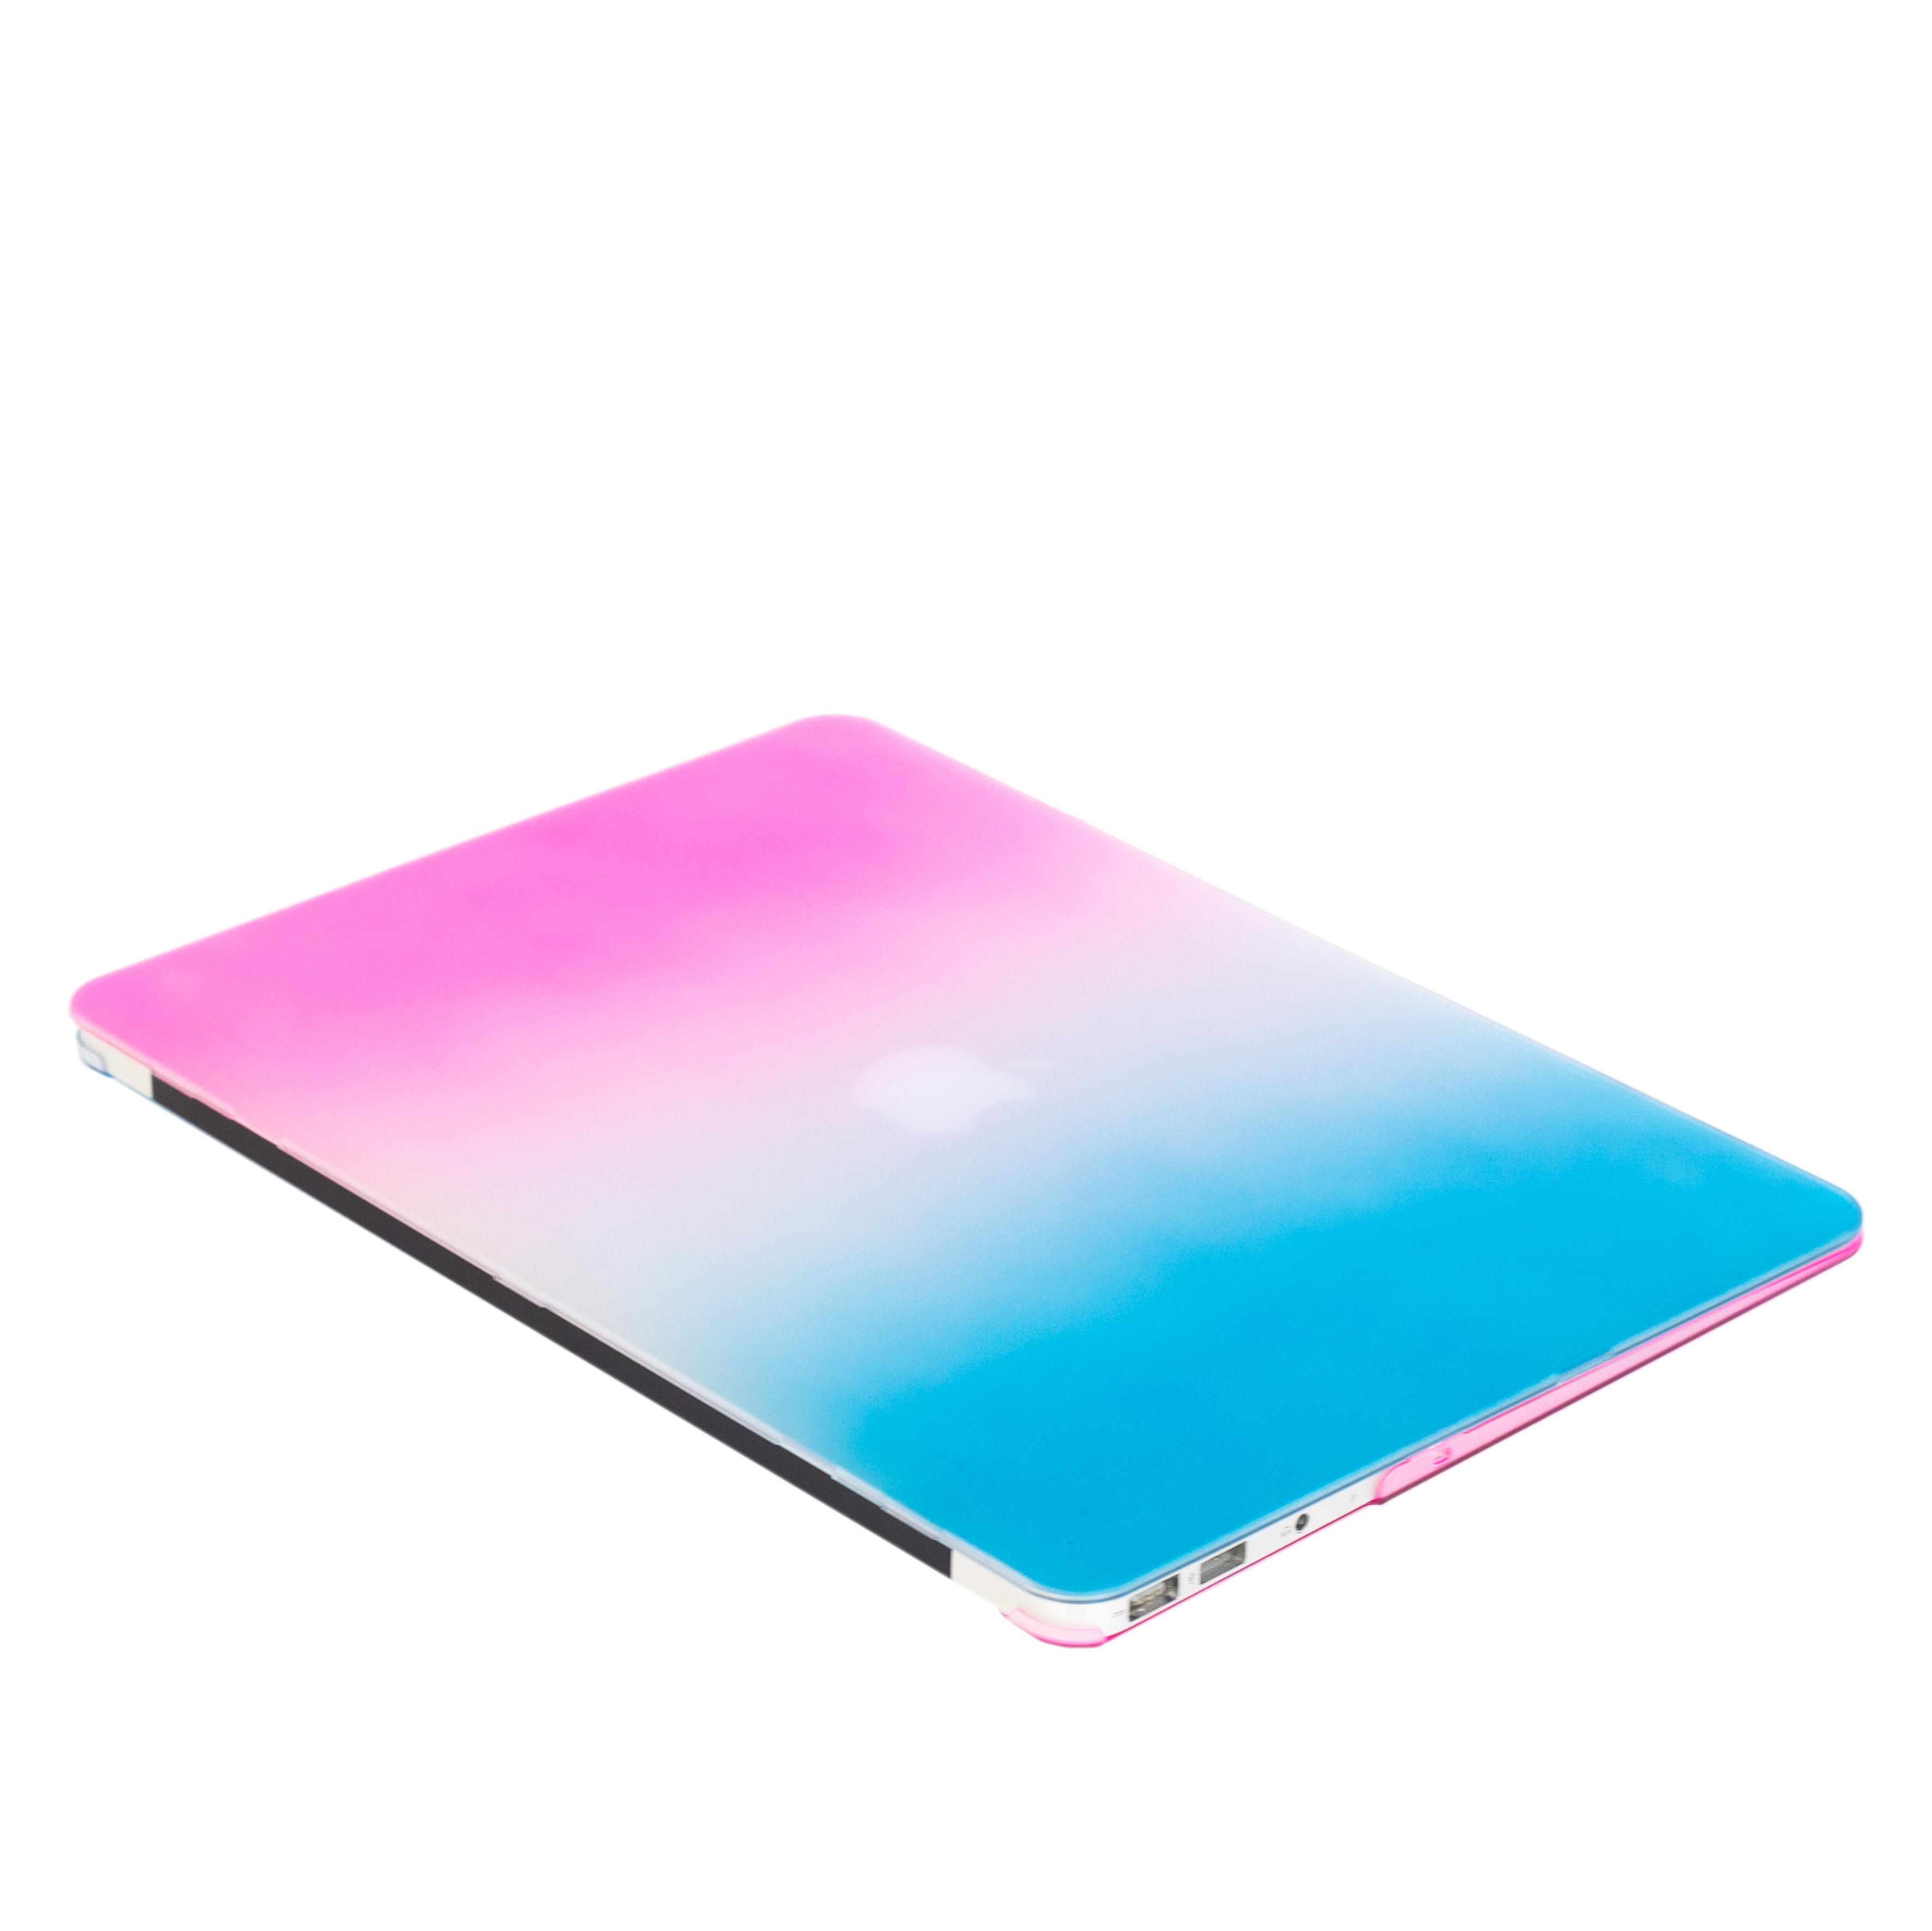 upcase rainbow macbook air 11 6. Black Bedroom Furniture Sets. Home Design Ideas